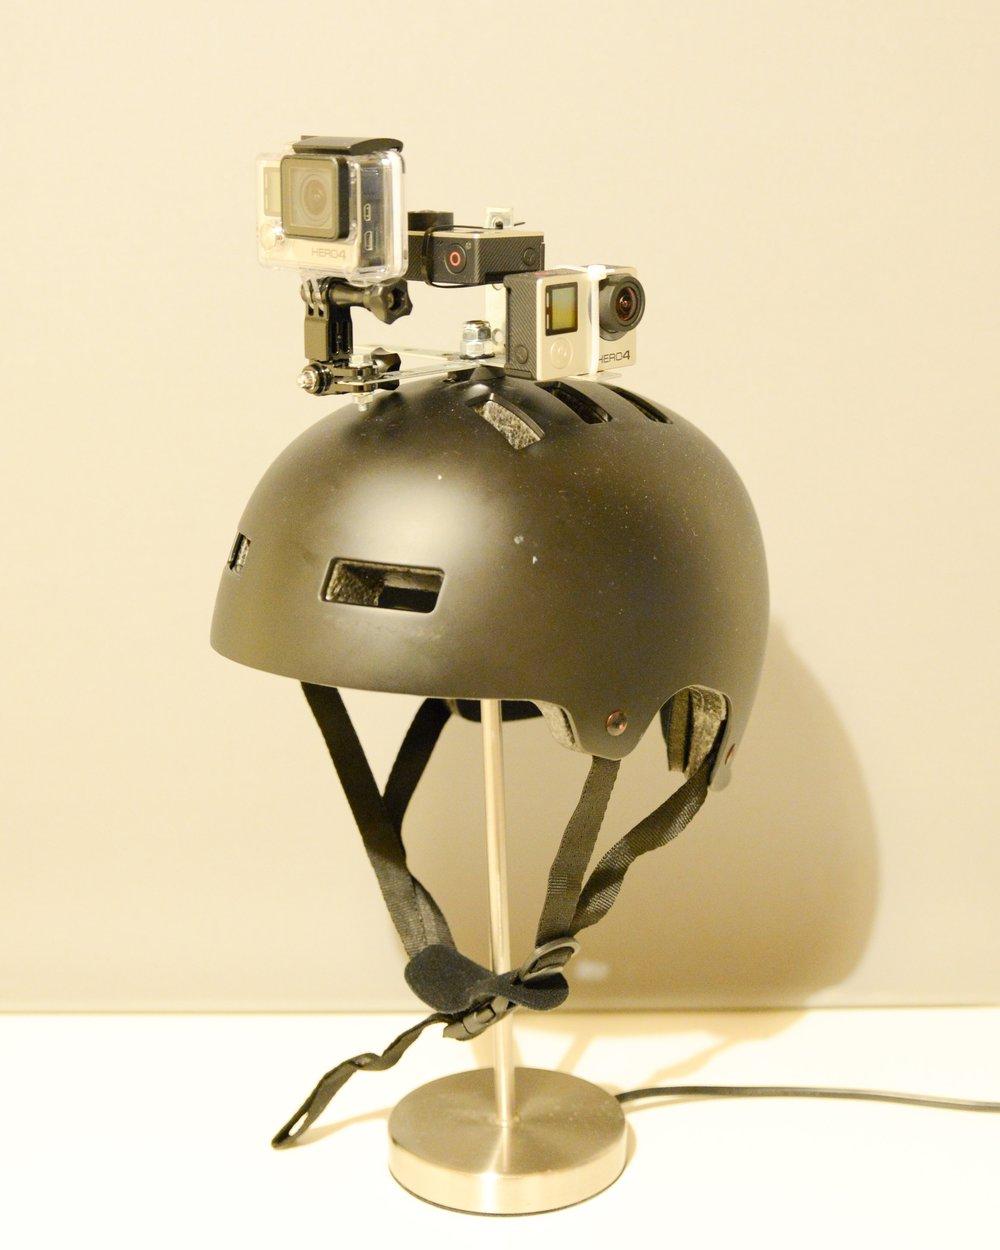 Three cameras attached a helmet following X Y Z axis.